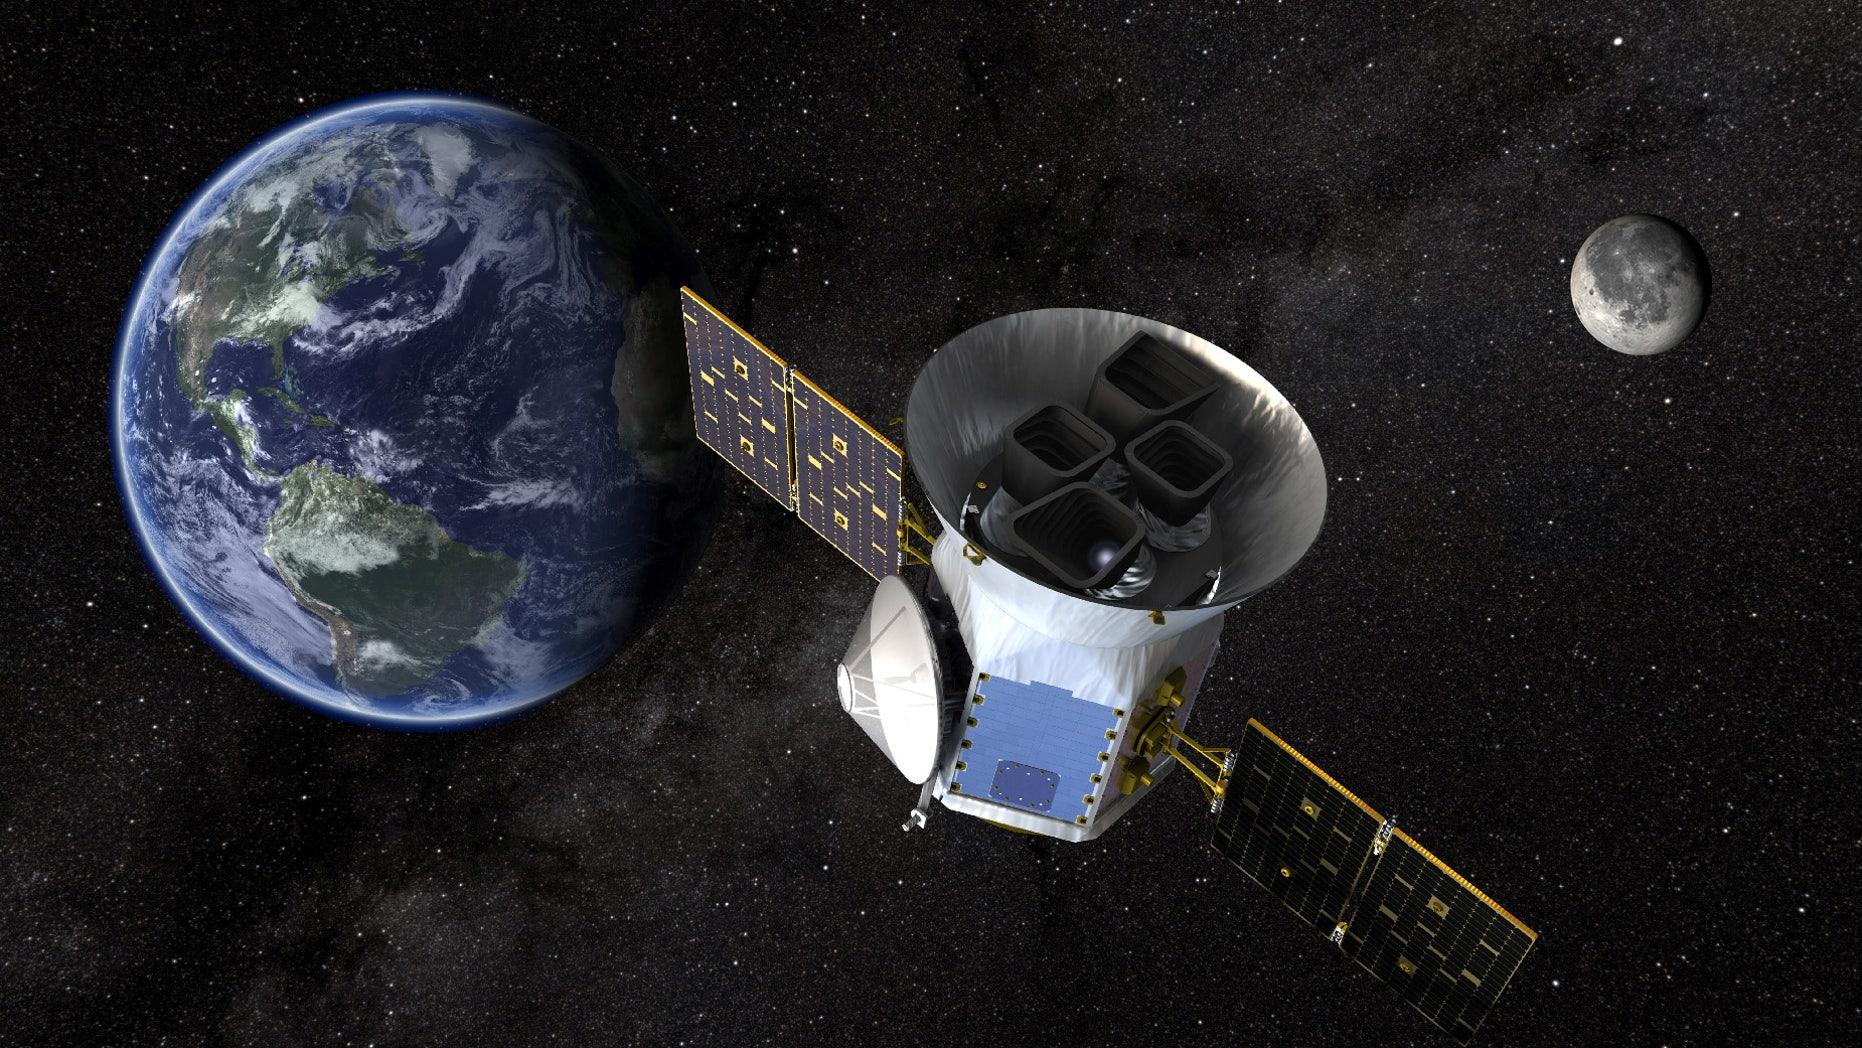 (Credit: NASA's Goddard Space Flight Center/Handout via REUTERS)